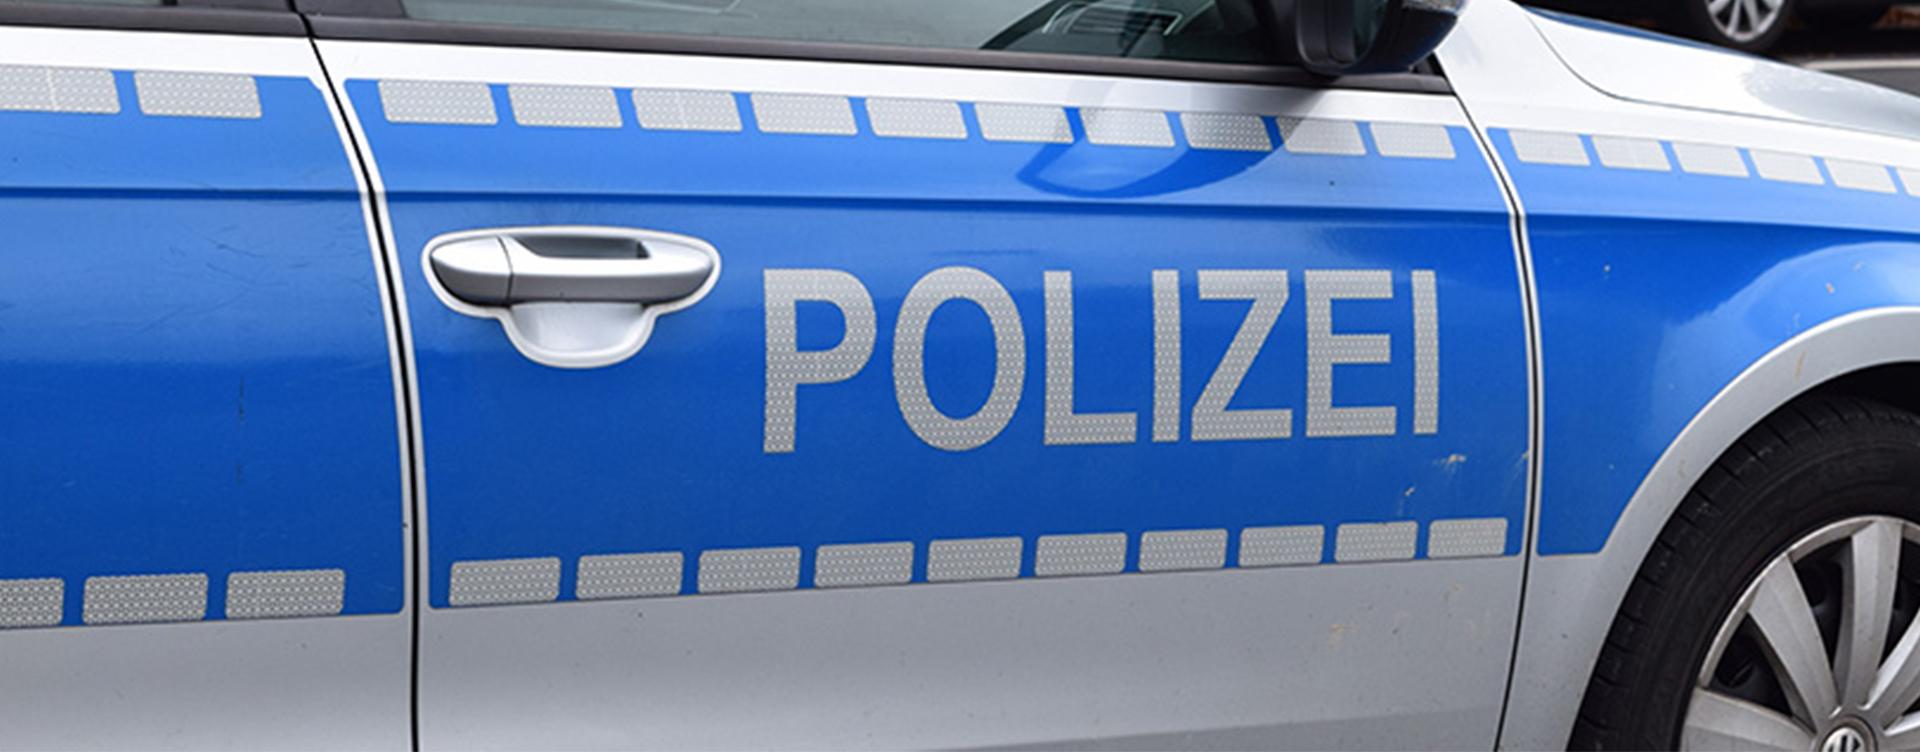 Polizeidienststellen - vegesack.de